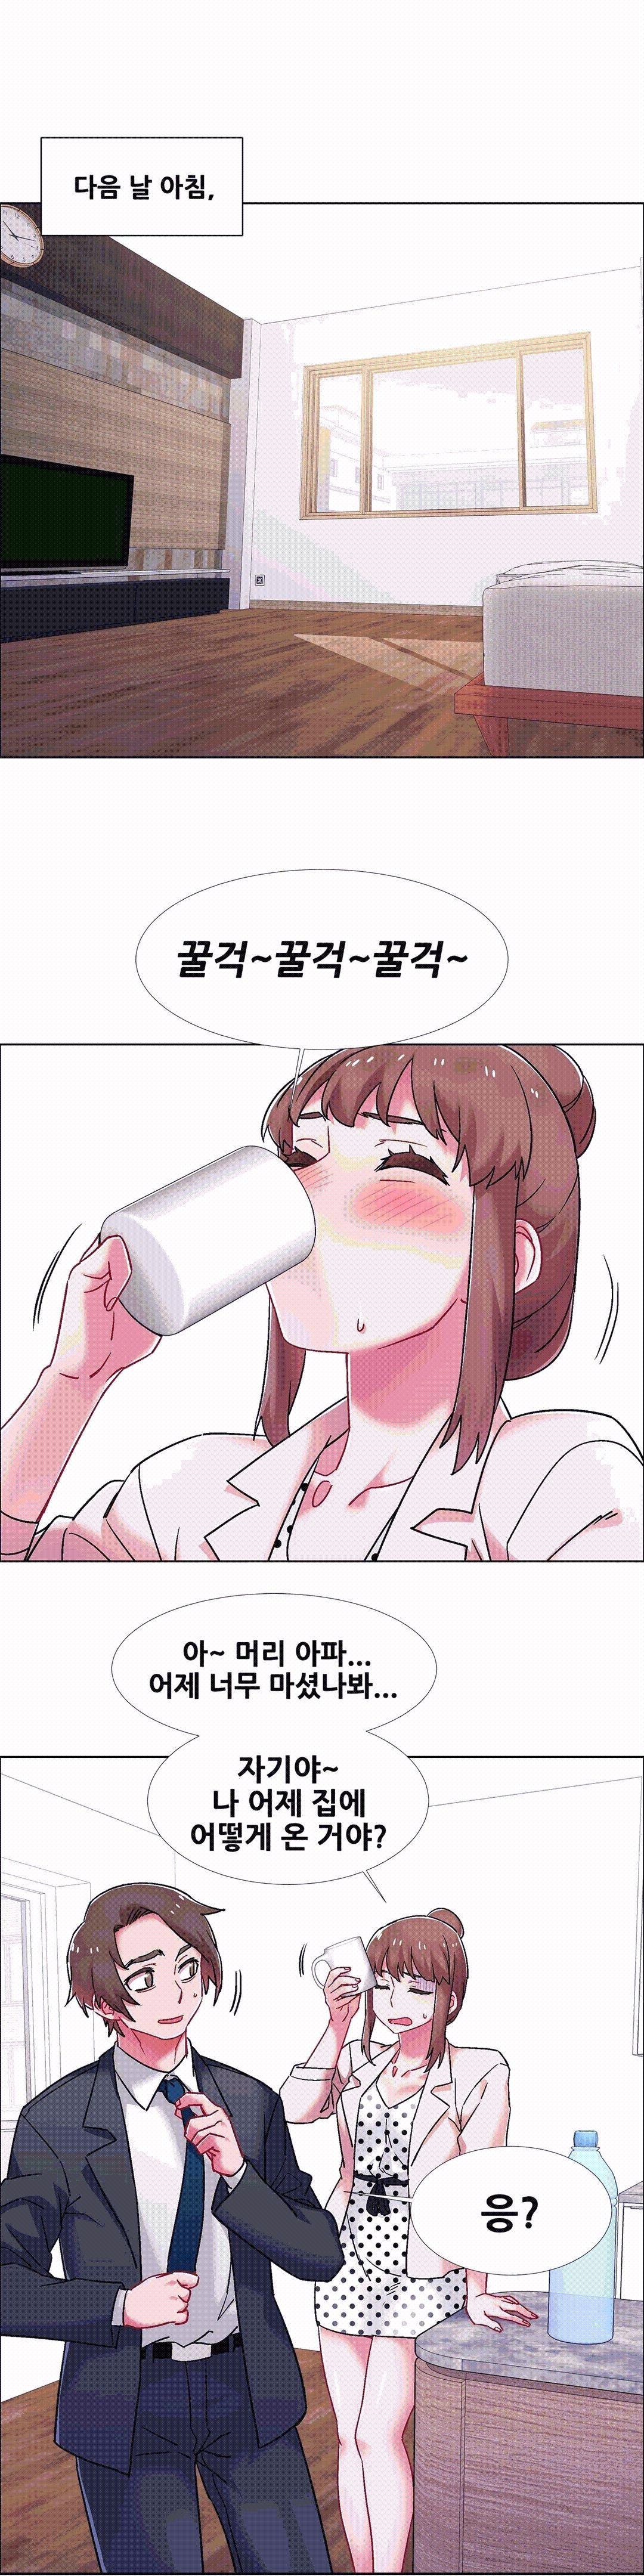 [Studio Wannabe] Rental Girls | 出租女郎 Ch. 33-58 [Chinese]  第二季 完结 635